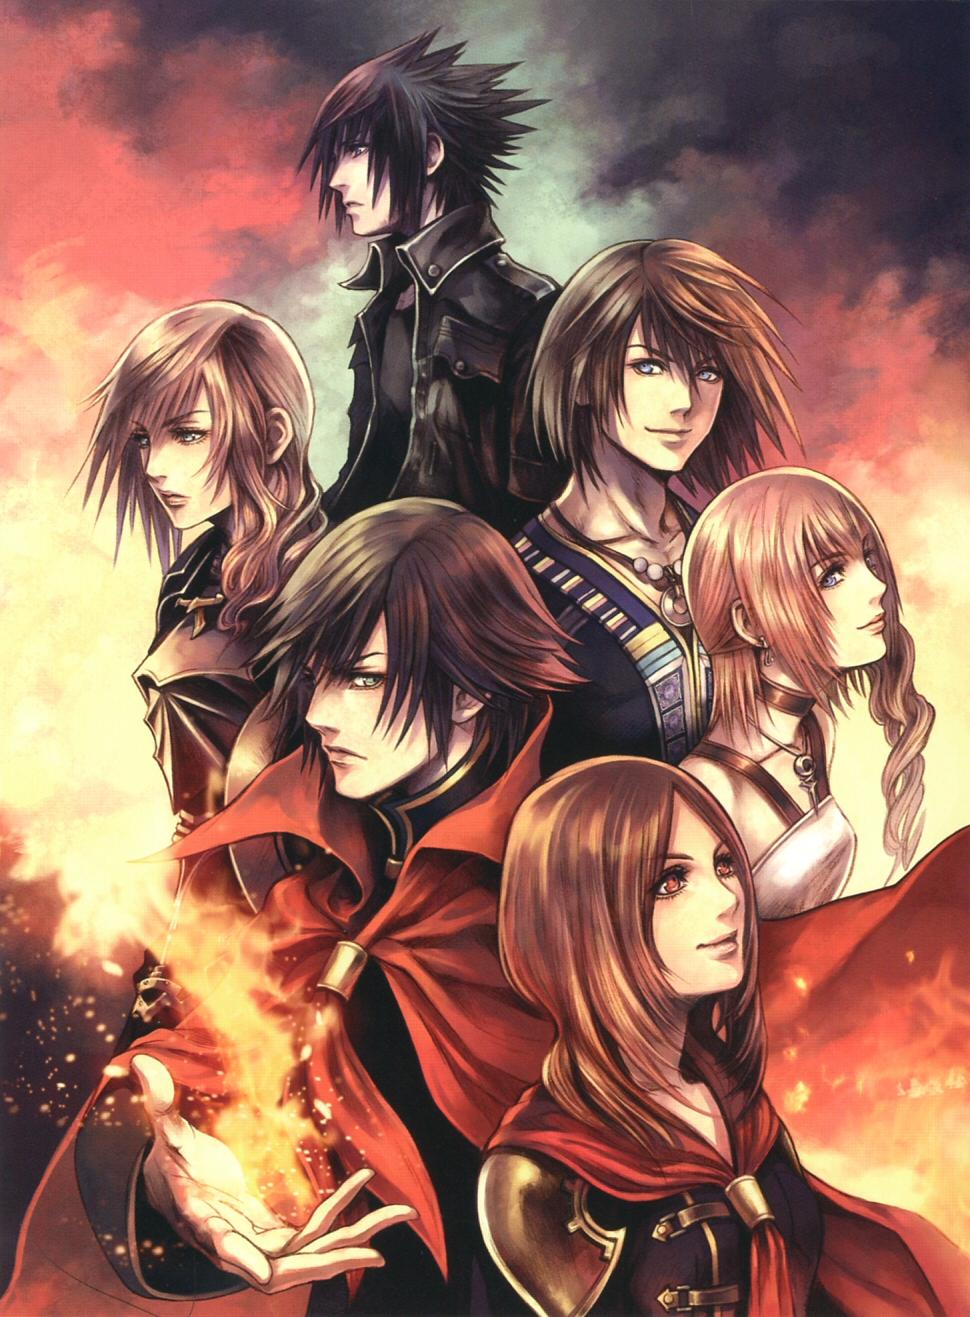 Final Fantasy Serah And Lightning Final Fantasy XIII Ima...